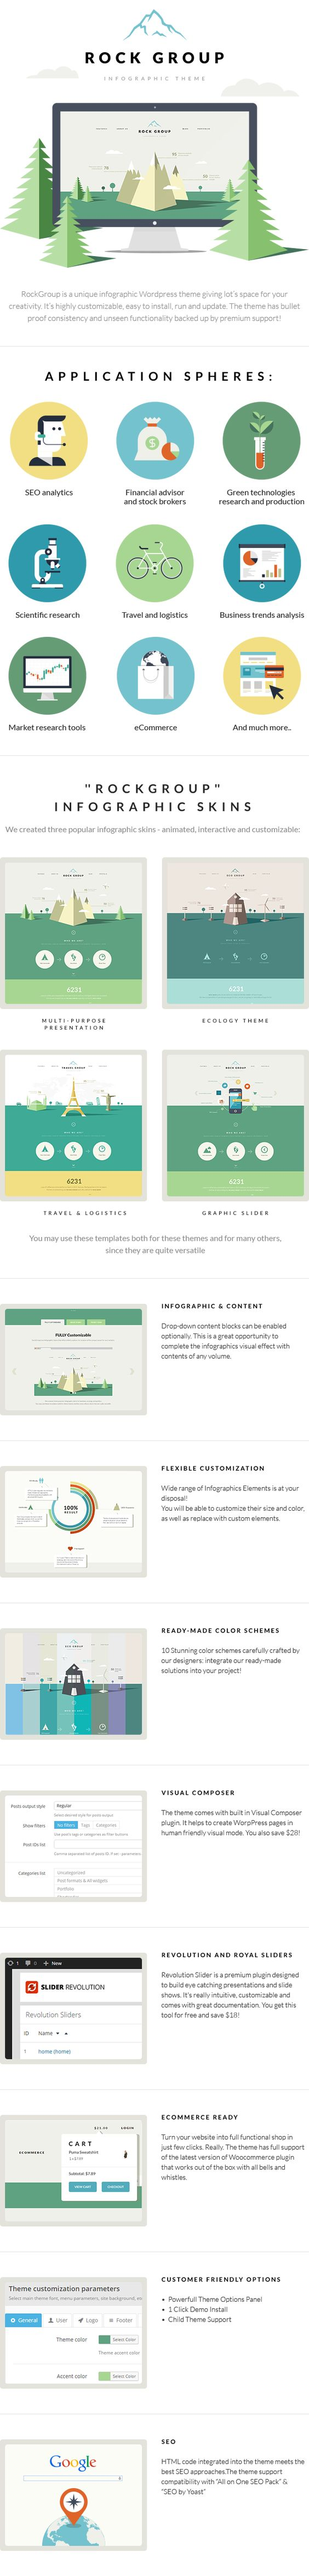 Multipurpose Infographic Theme